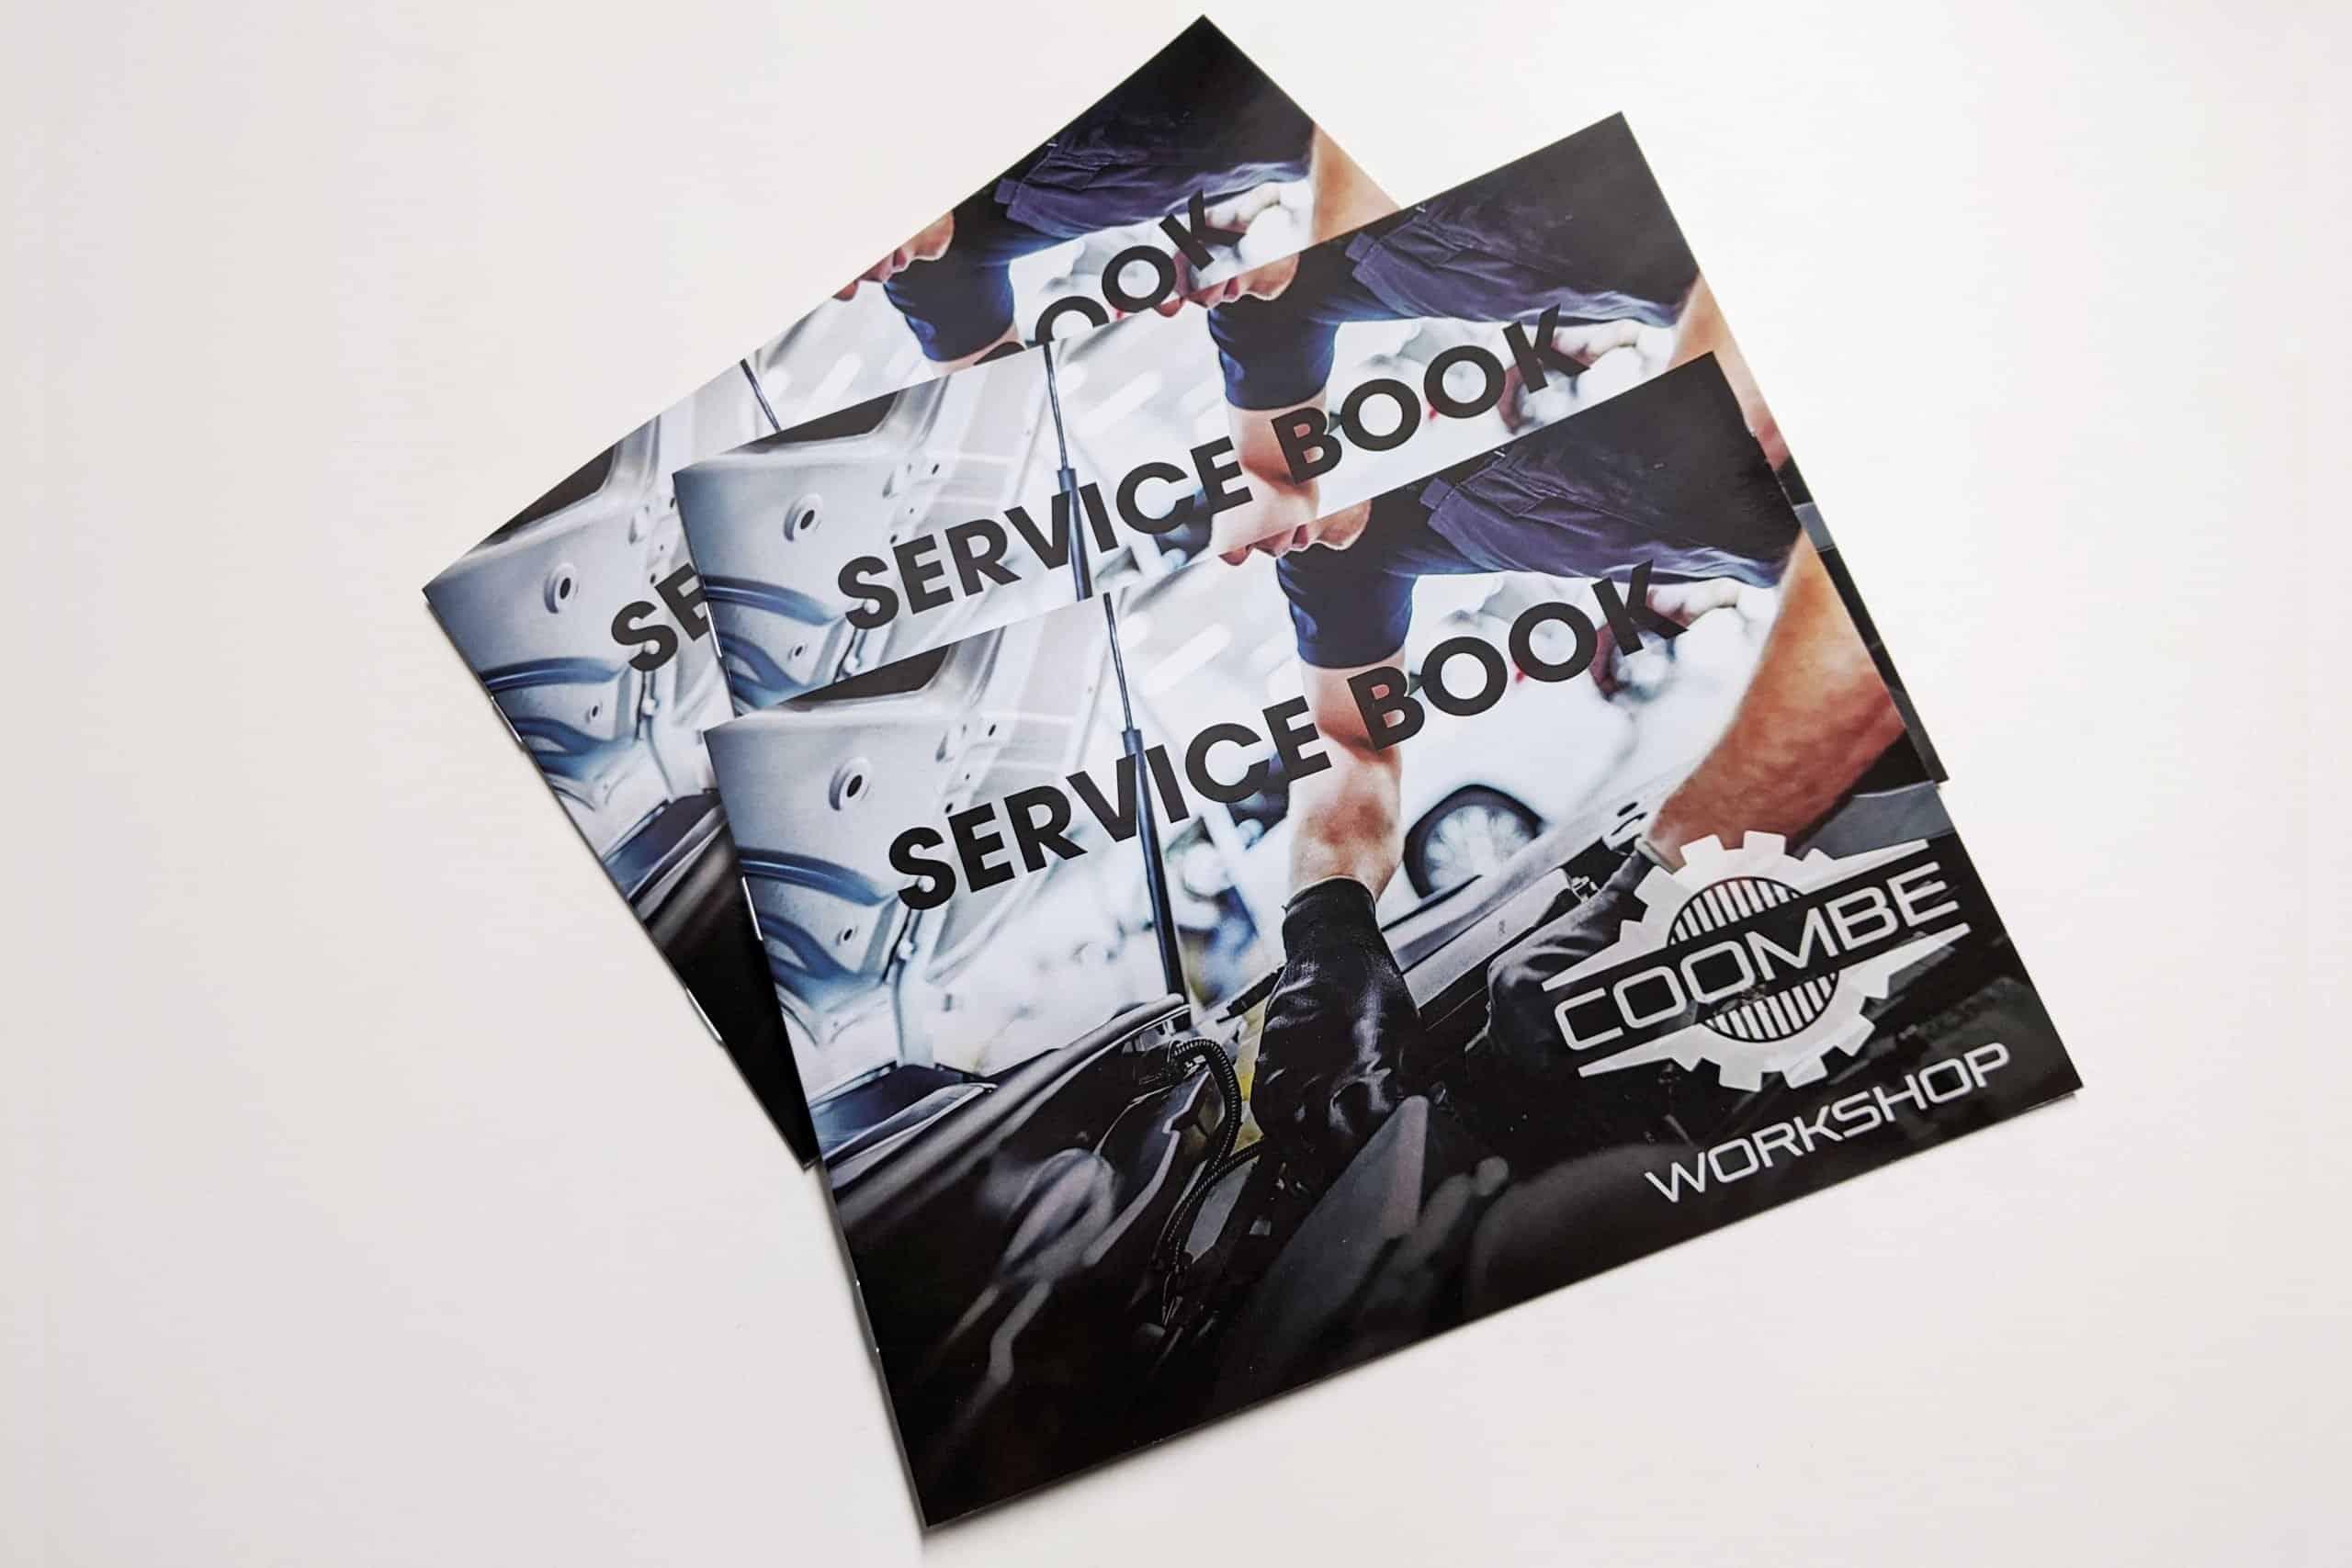 printed service books